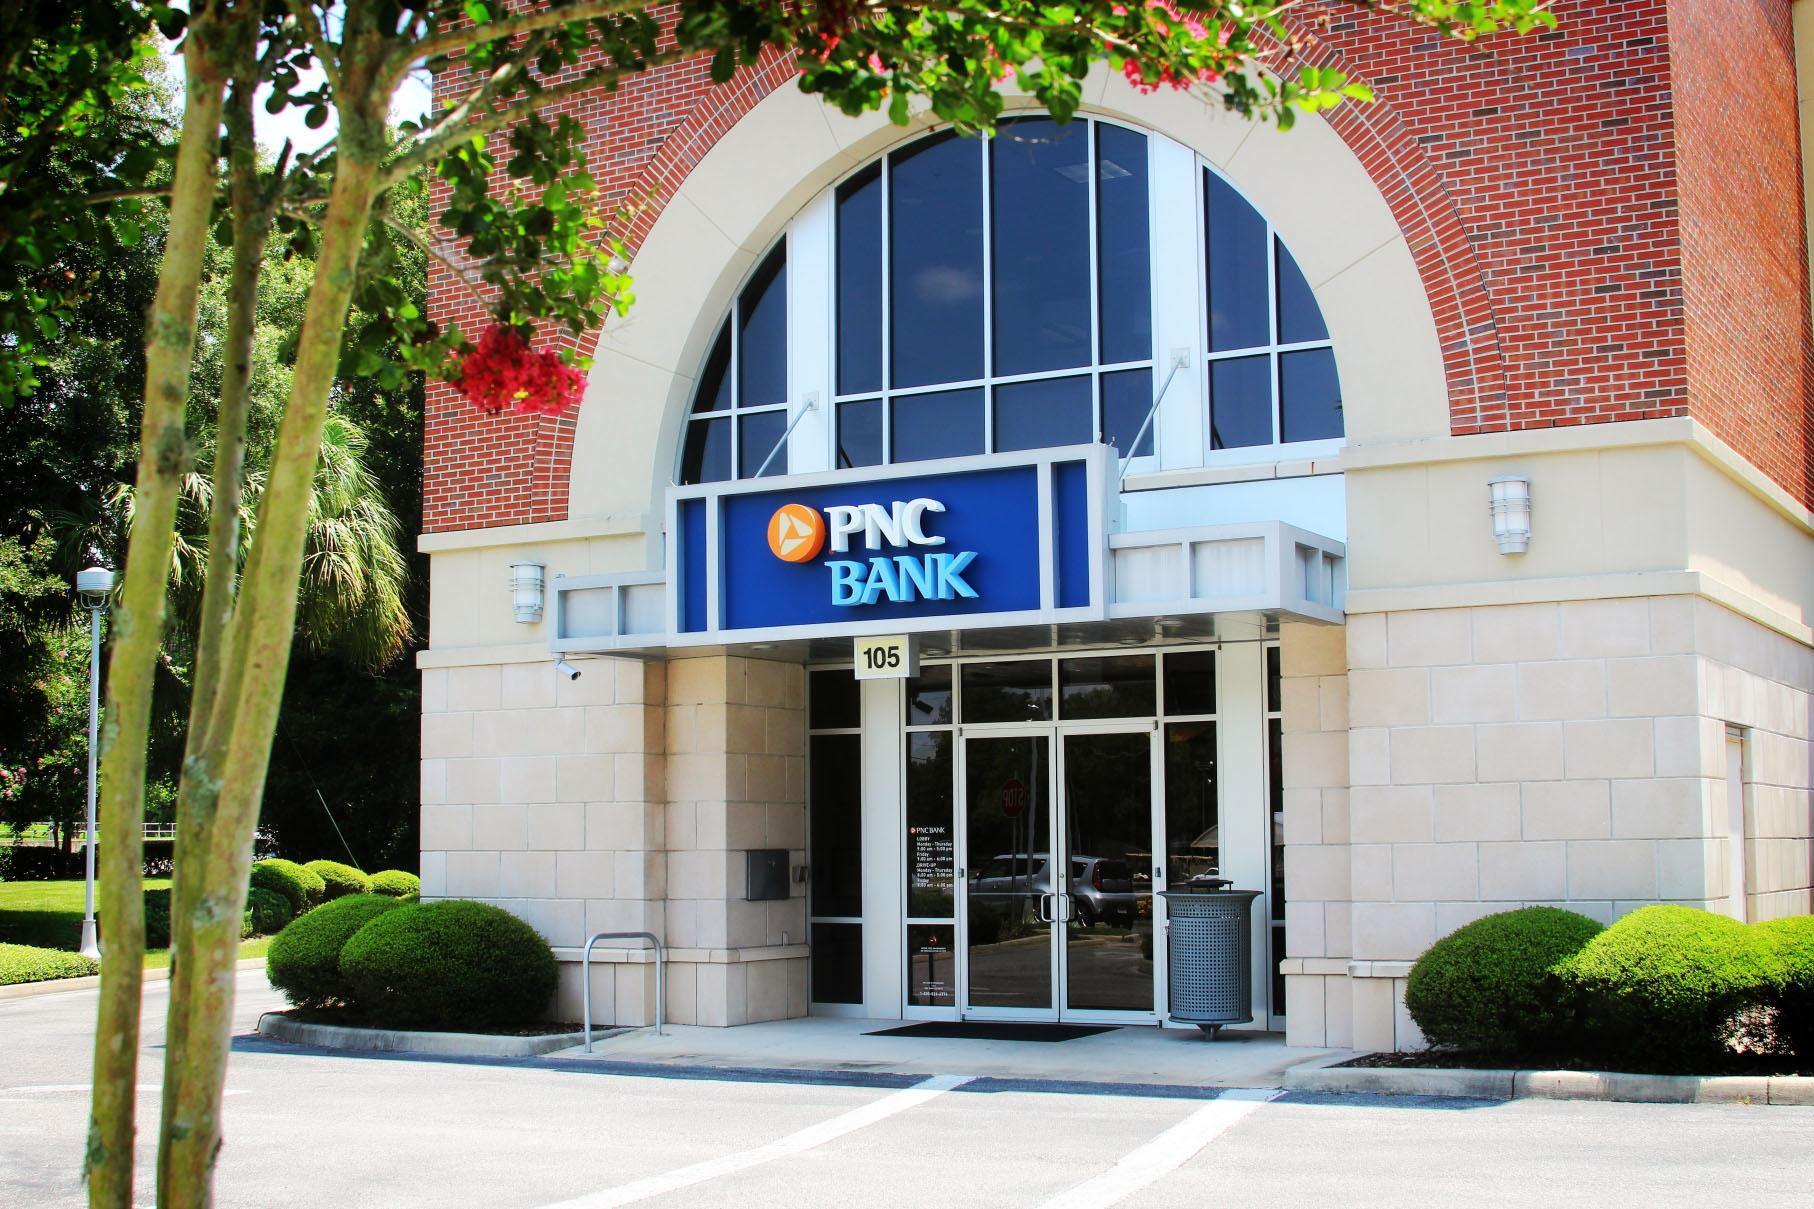 pnc bank full name